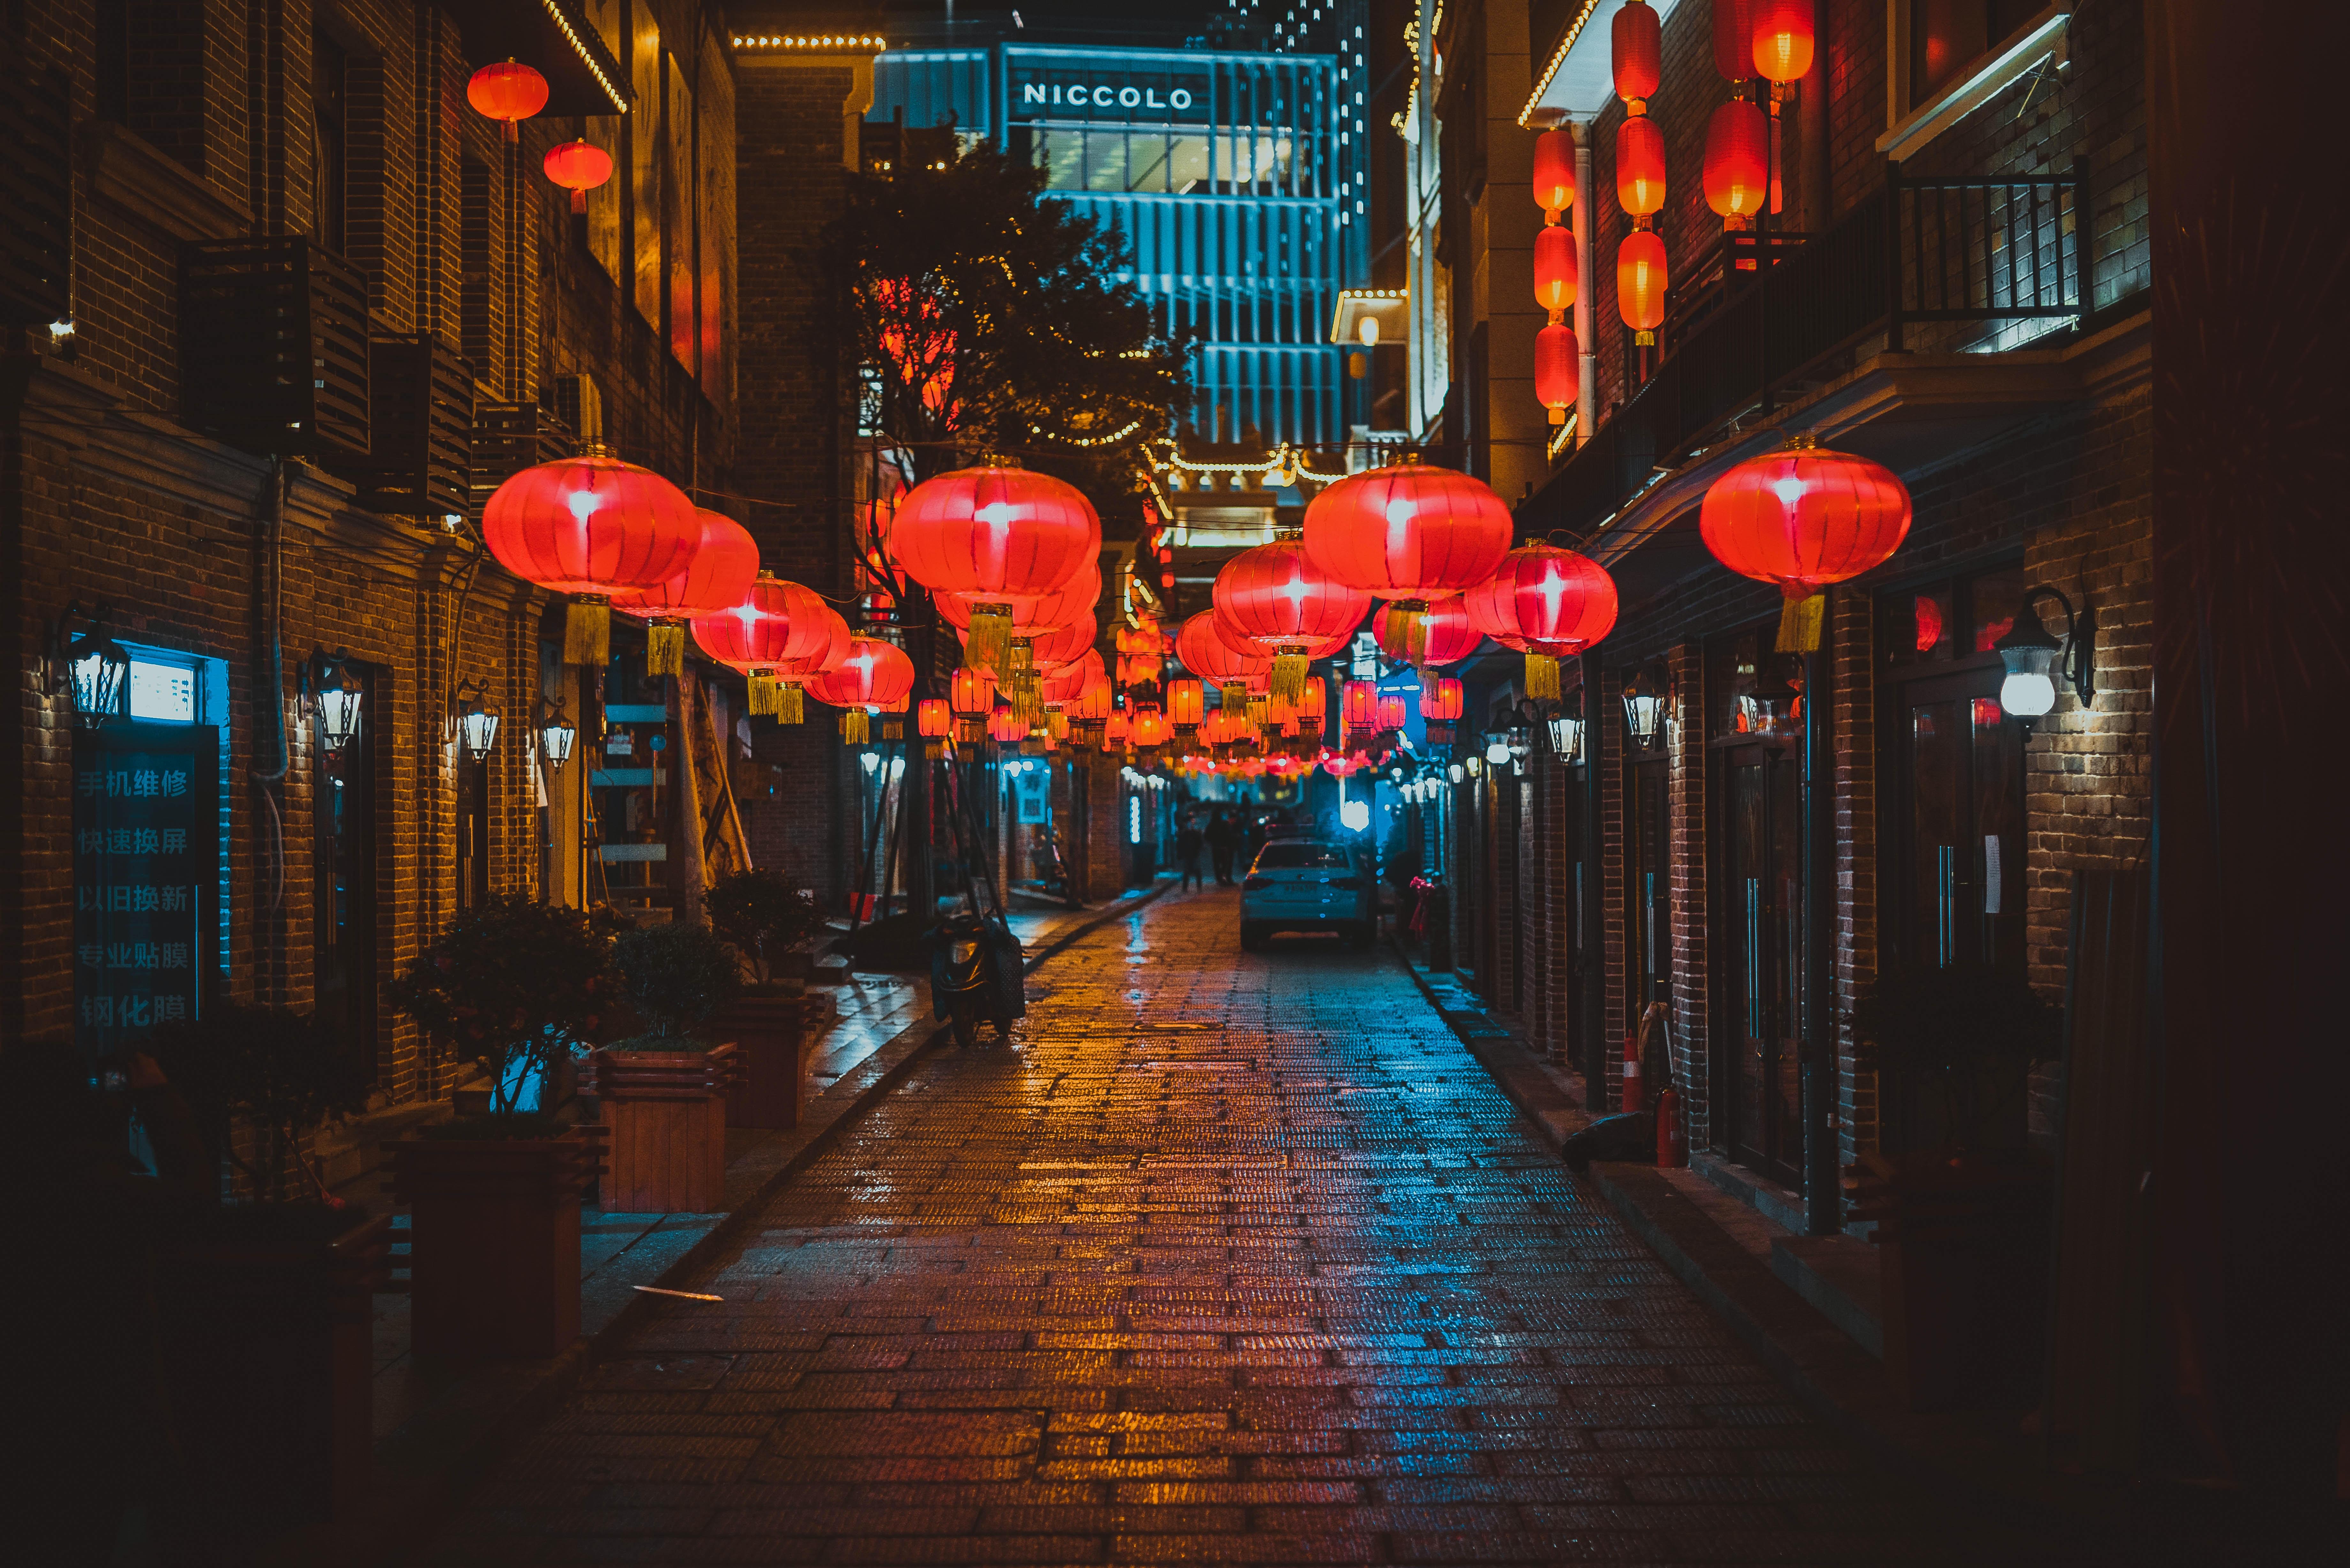 red lanterns turned on